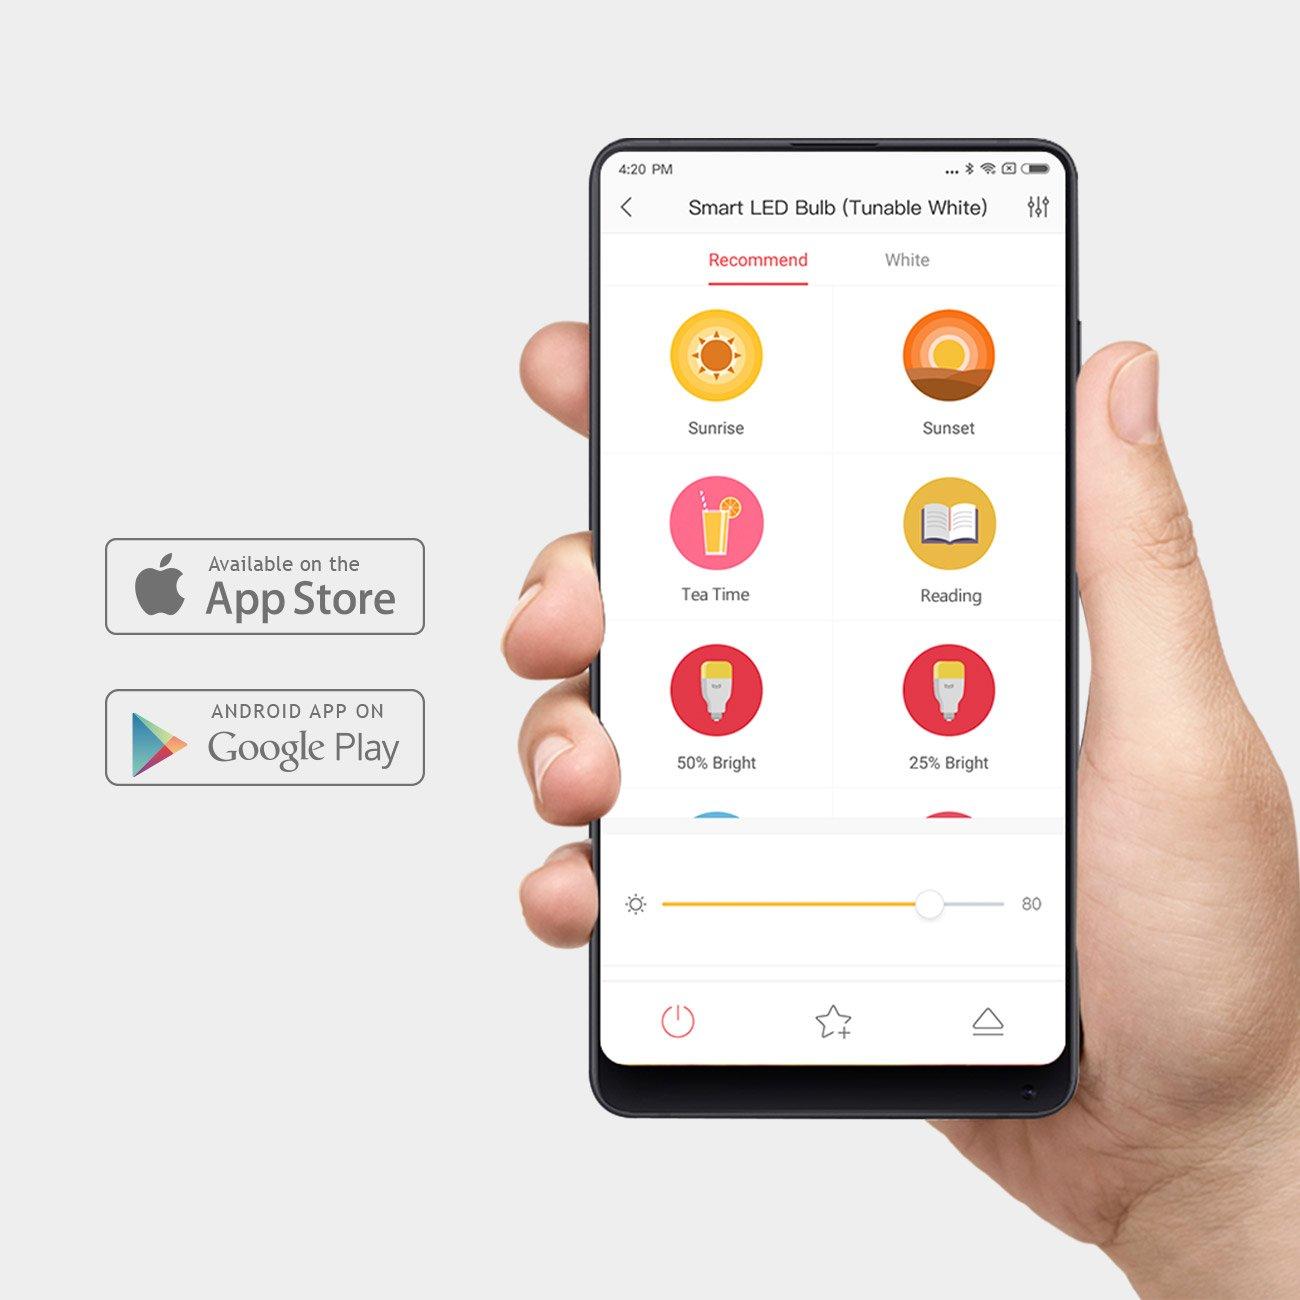 YEELIGHT Lemon Smart LED WiFi Bombilla 10W E27 800lm Sin bombillas de iluminación Hub trabaja con Alexa, Asistente de Google (TUNABLE WHITE): Amazon.es: ...